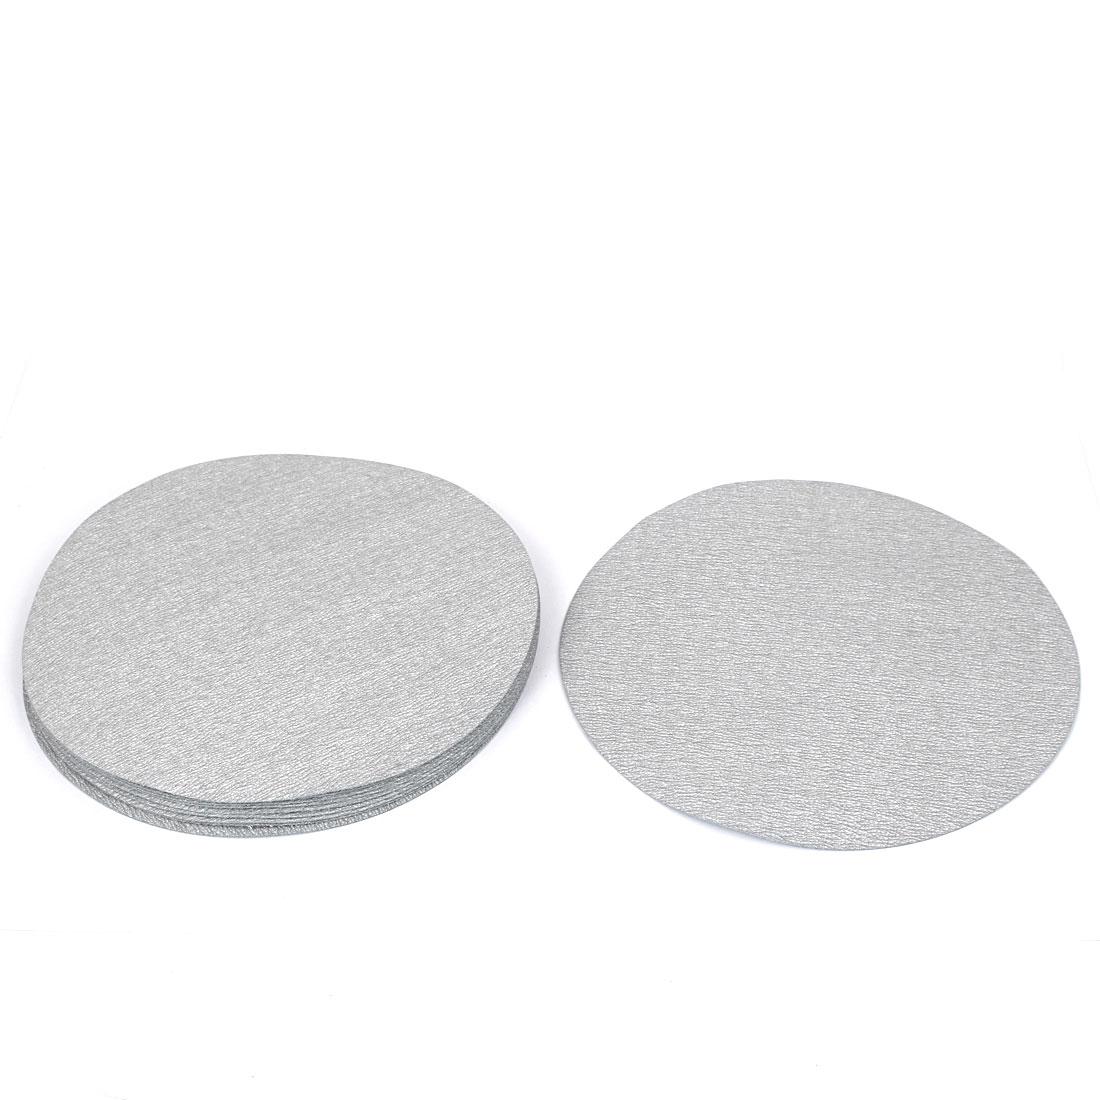 "7"" Dia Polishing Round Dry Abrasive Sanding Sandpaper Sheet Disc 800 Grit 10pcs"